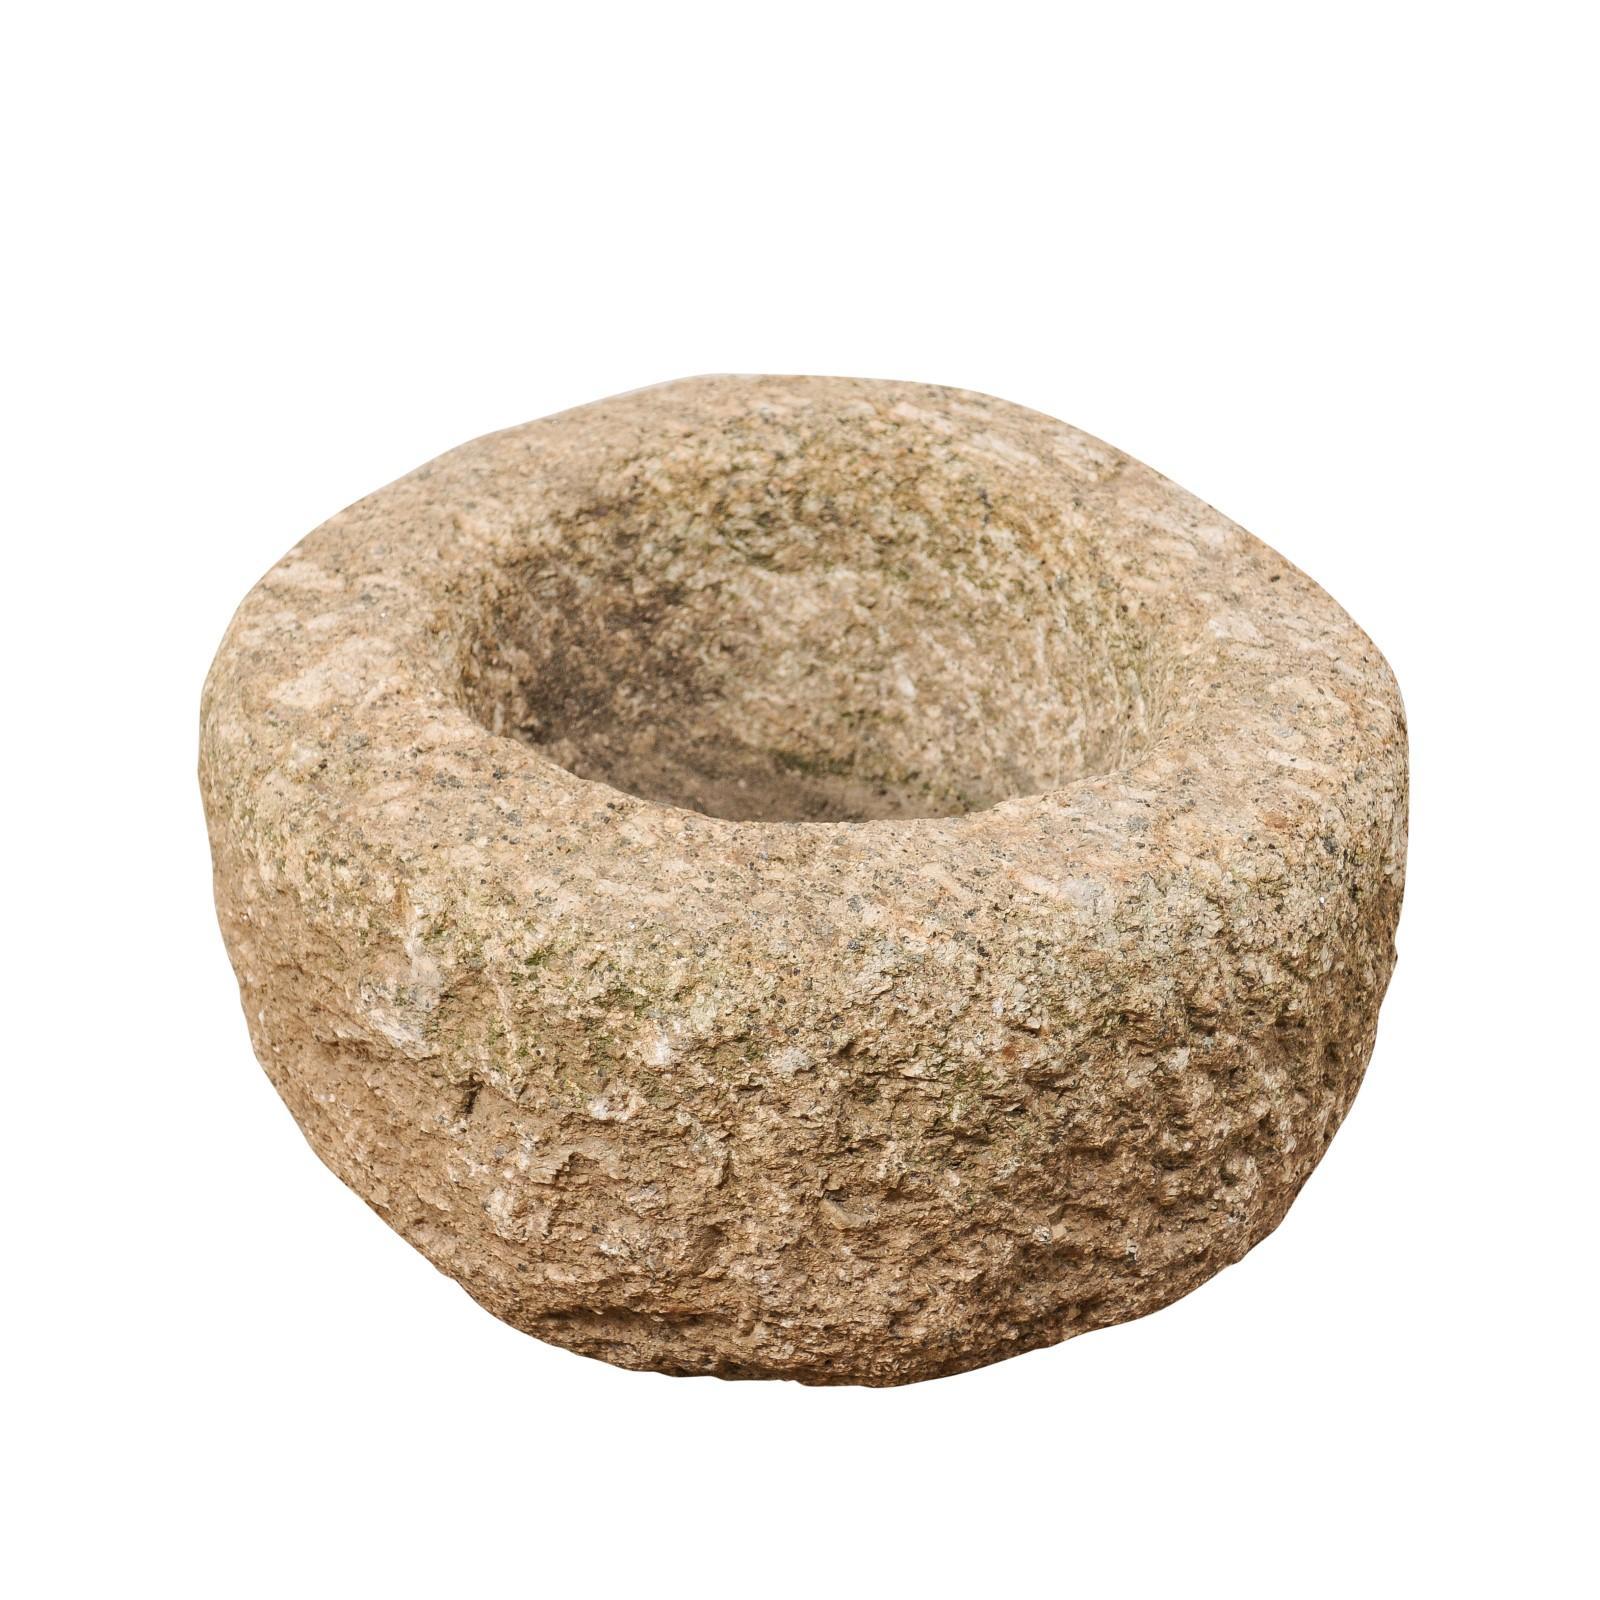 Spanish 19th Century Round Stone Vessel